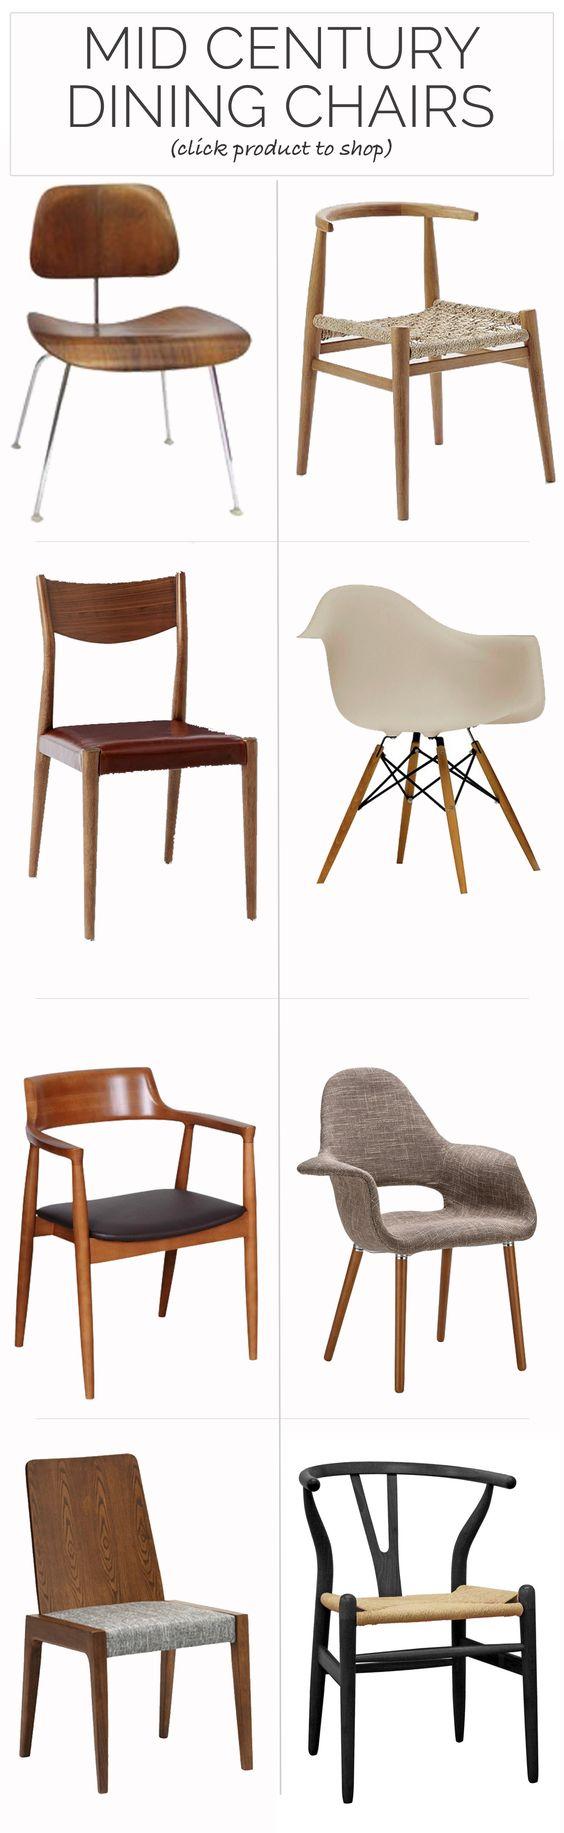 The Best Mid Century Dining Chairs - @mystylevita